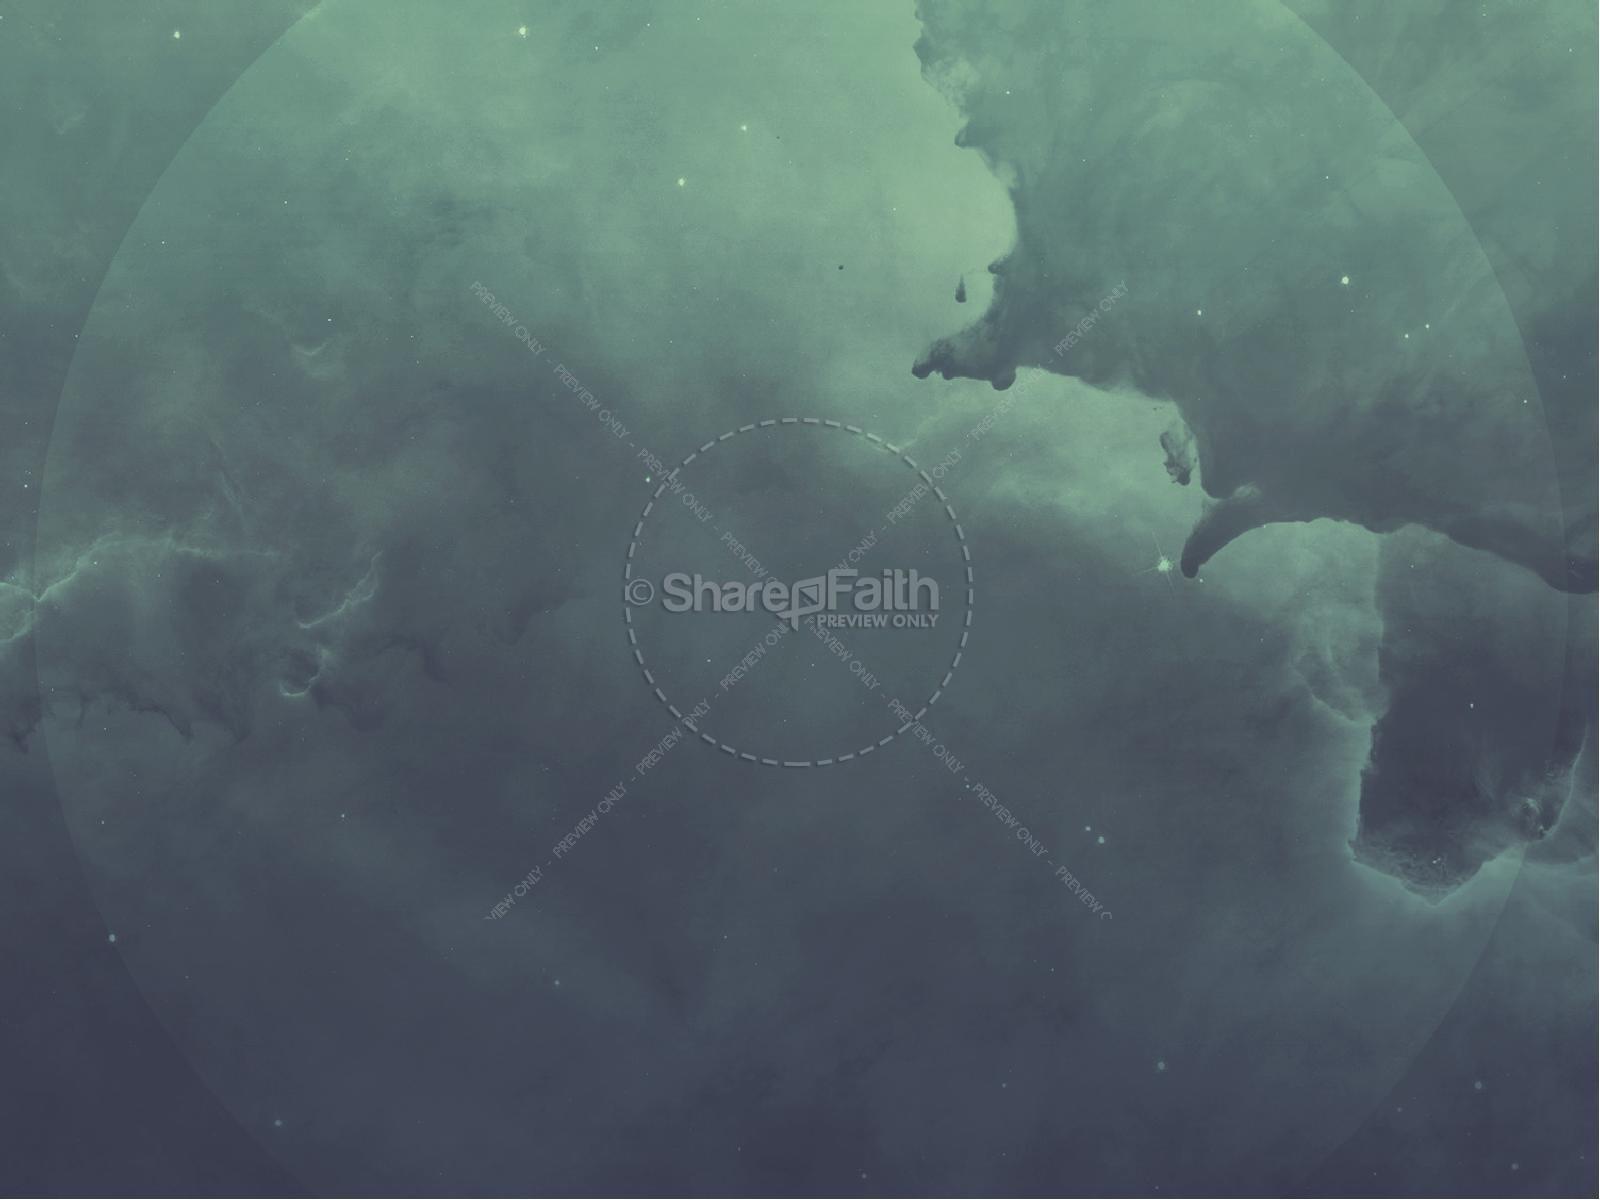 Genesis In The Beginning Sermon Graphic | slide 6